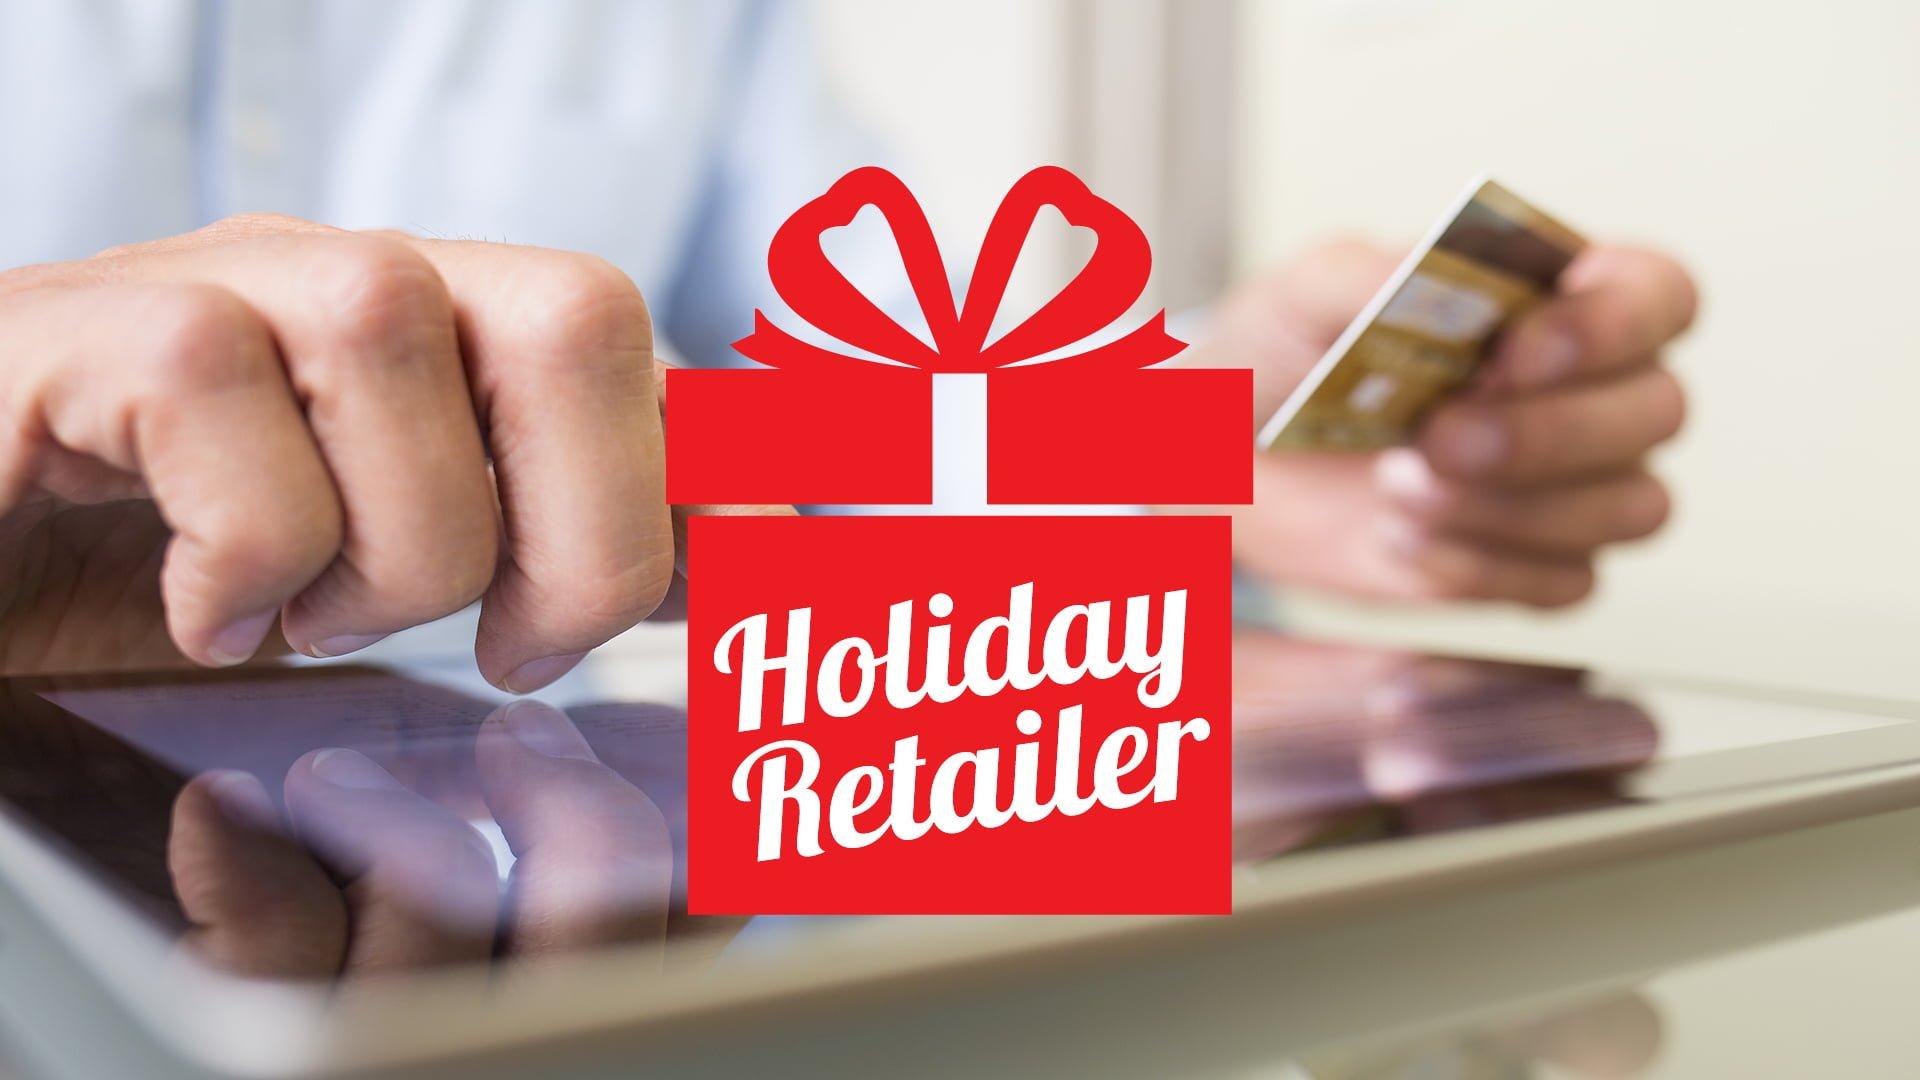 Holiday e-commerce revenue will surpass $100B, according to Adobe